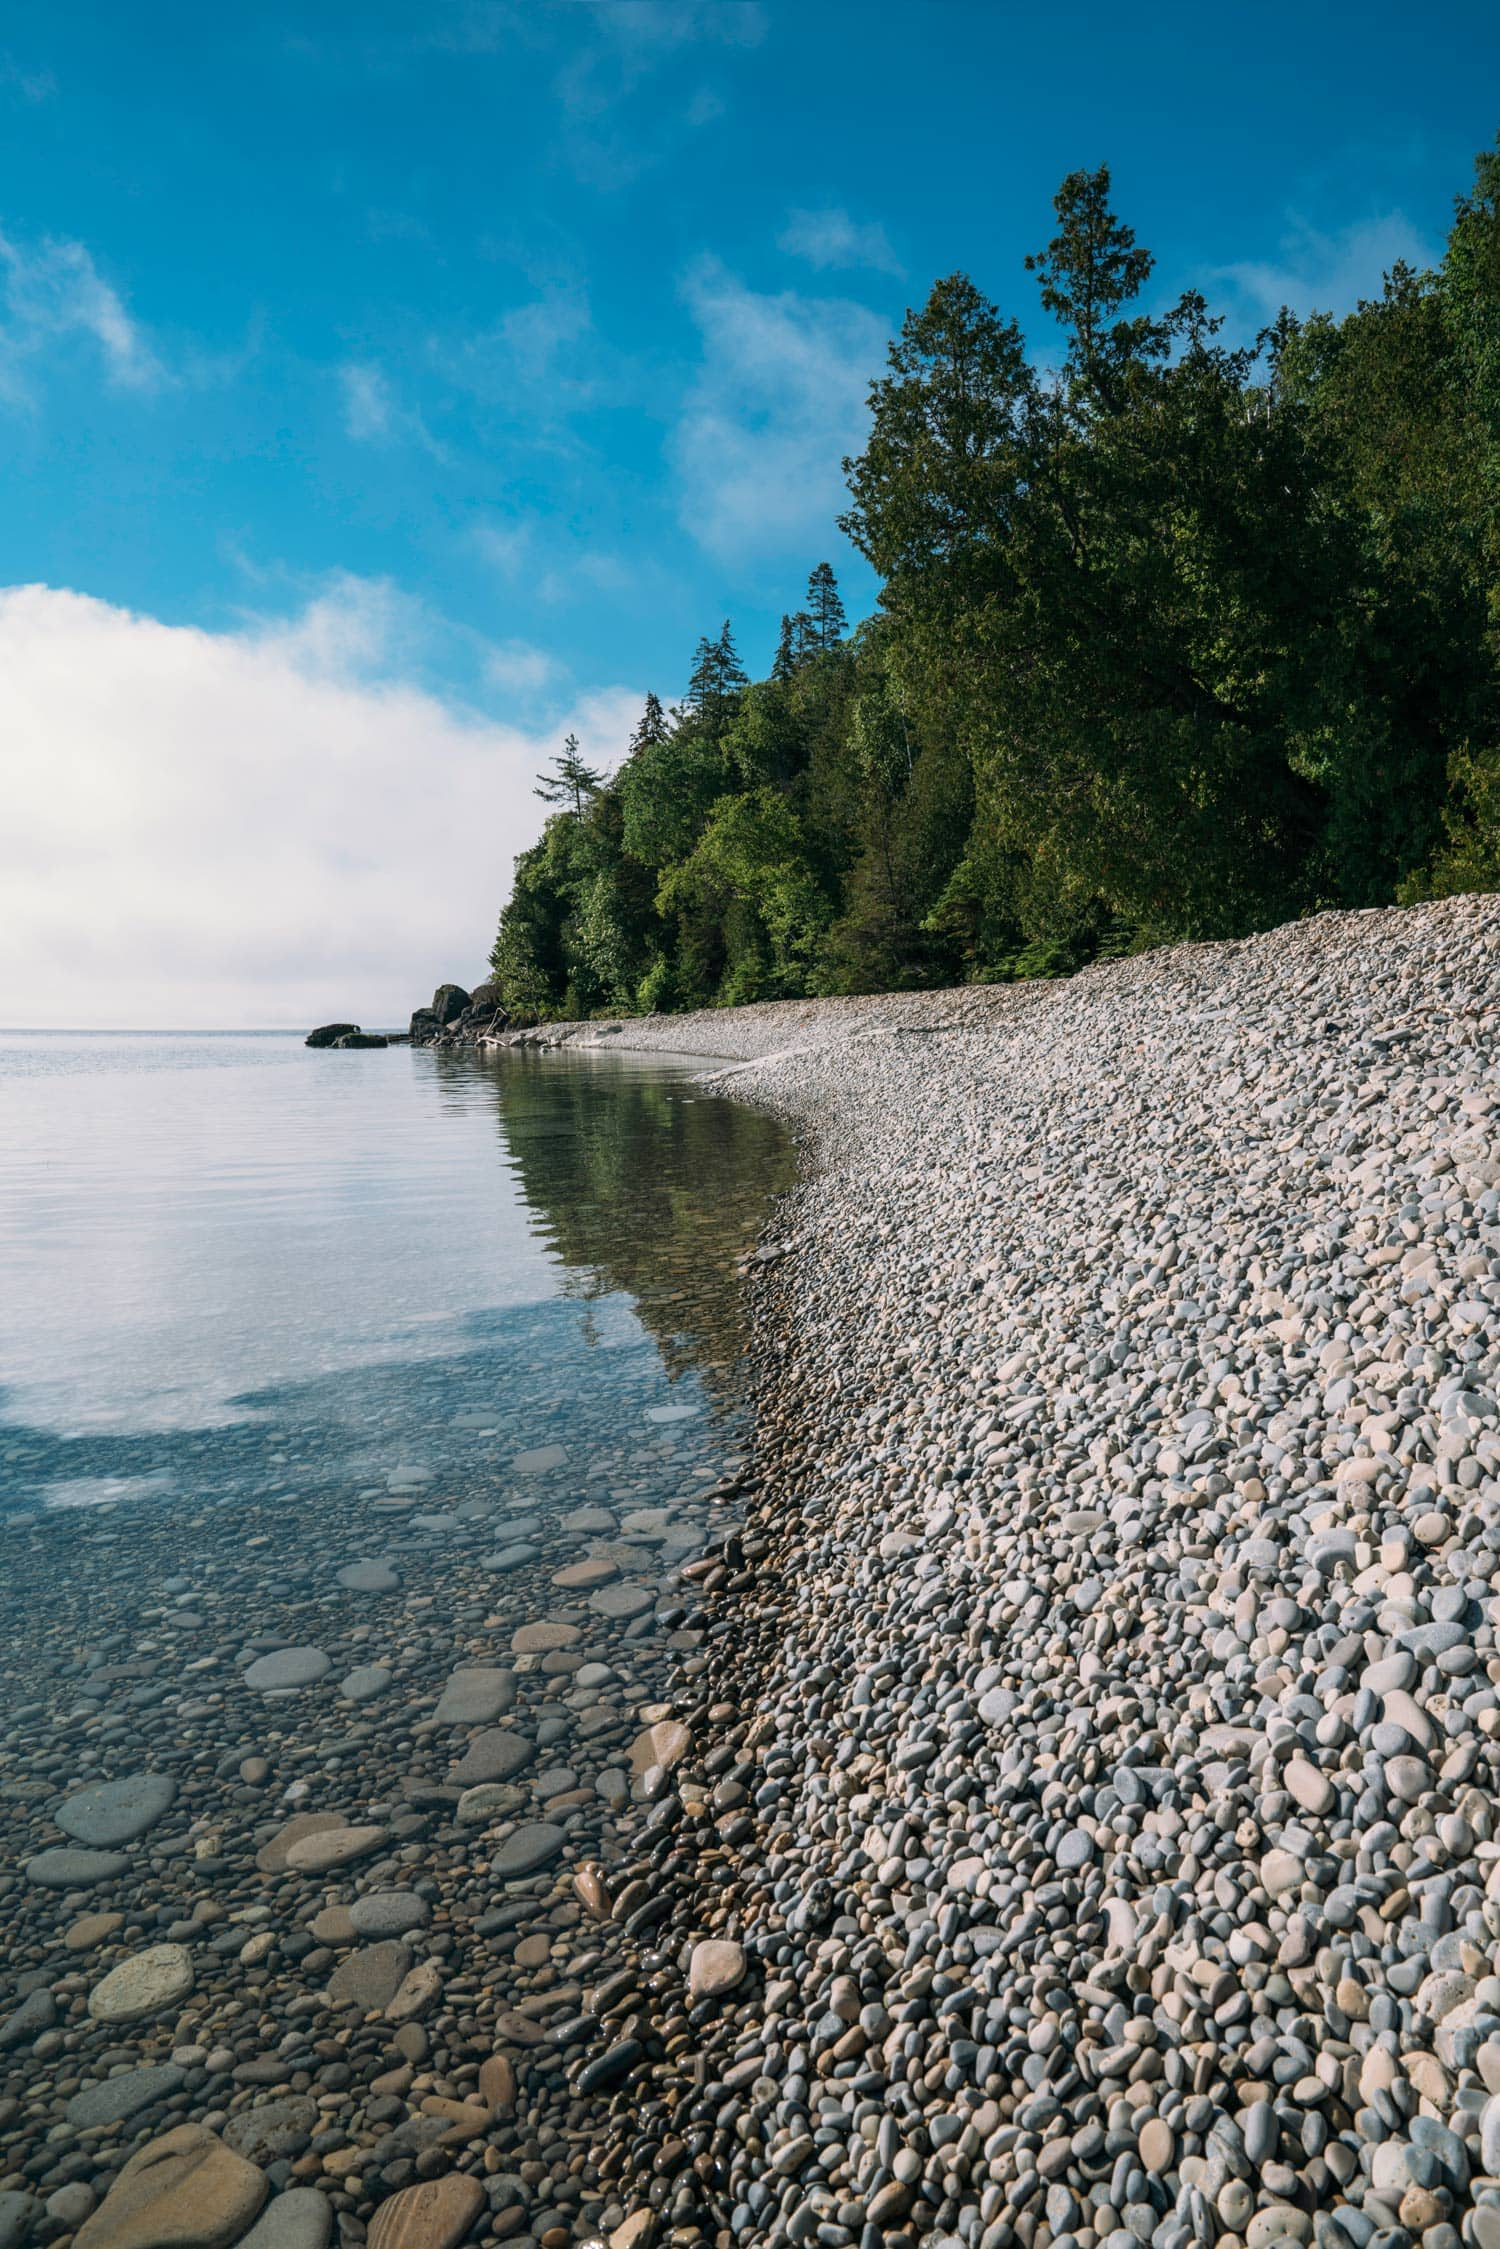 Landscape-Photography-Clear-Water-Shore-Presetpro.com